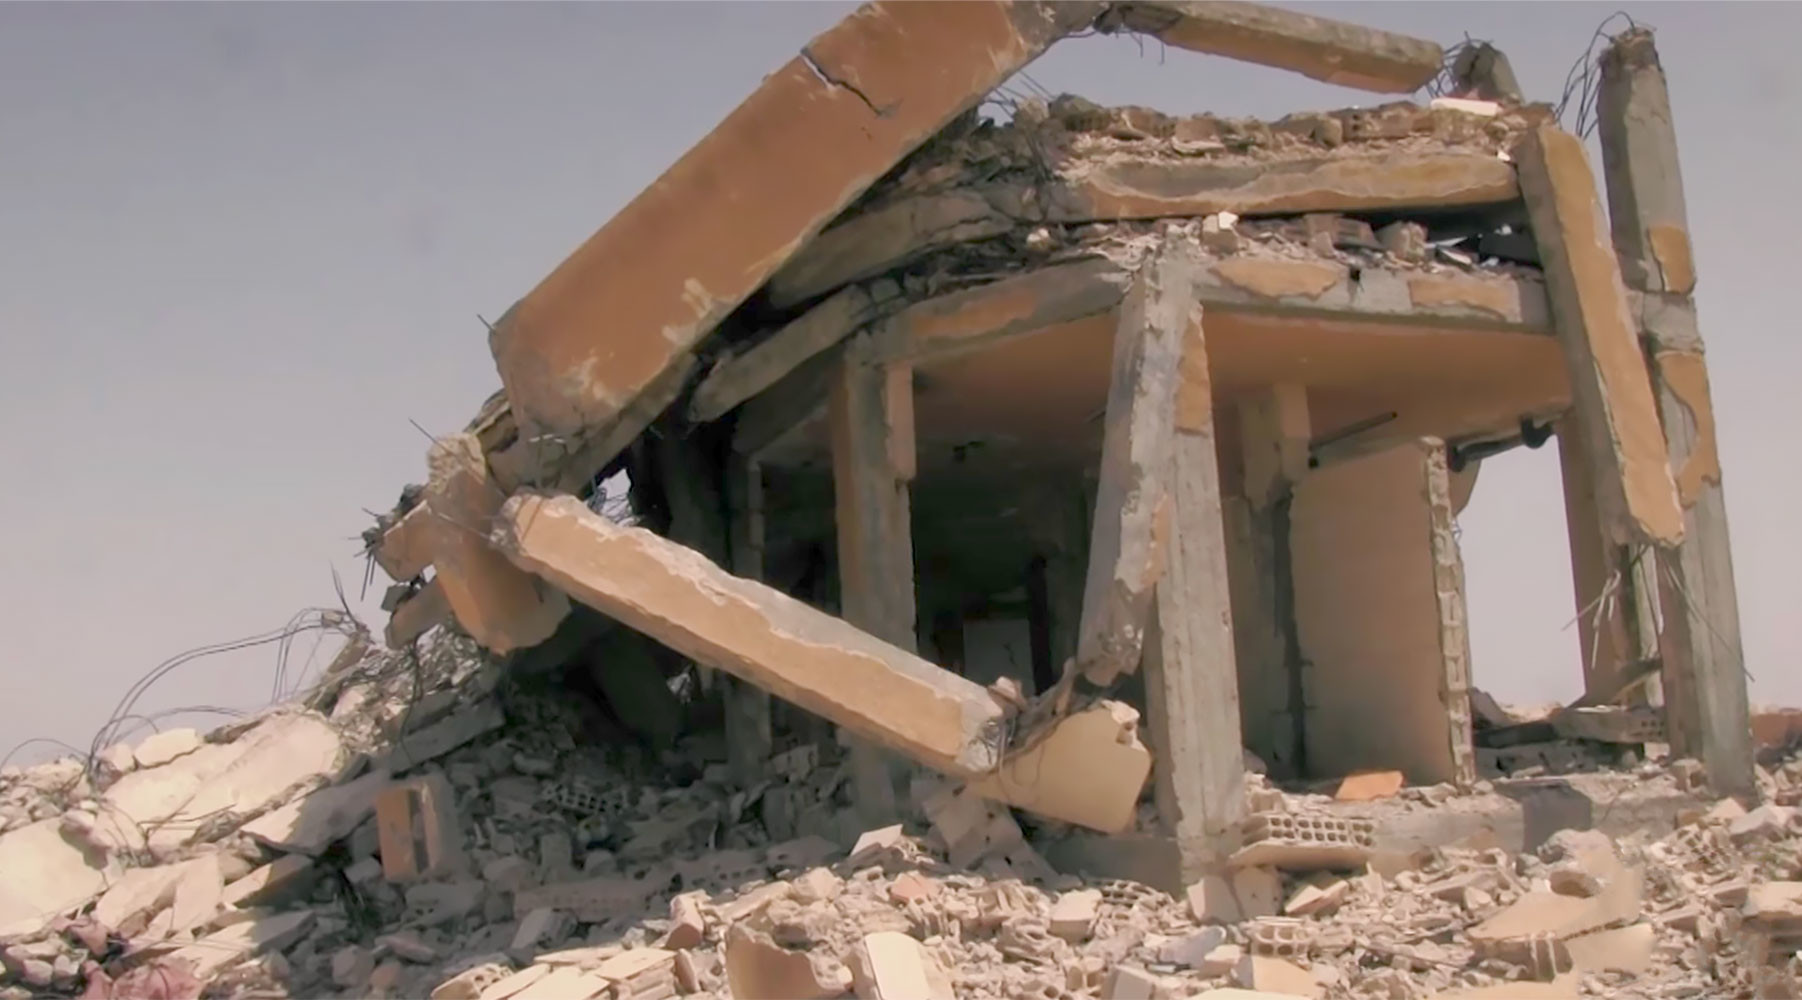 Защитники прав человека сообщили о84 жертвах при ударах коалиции вСирии